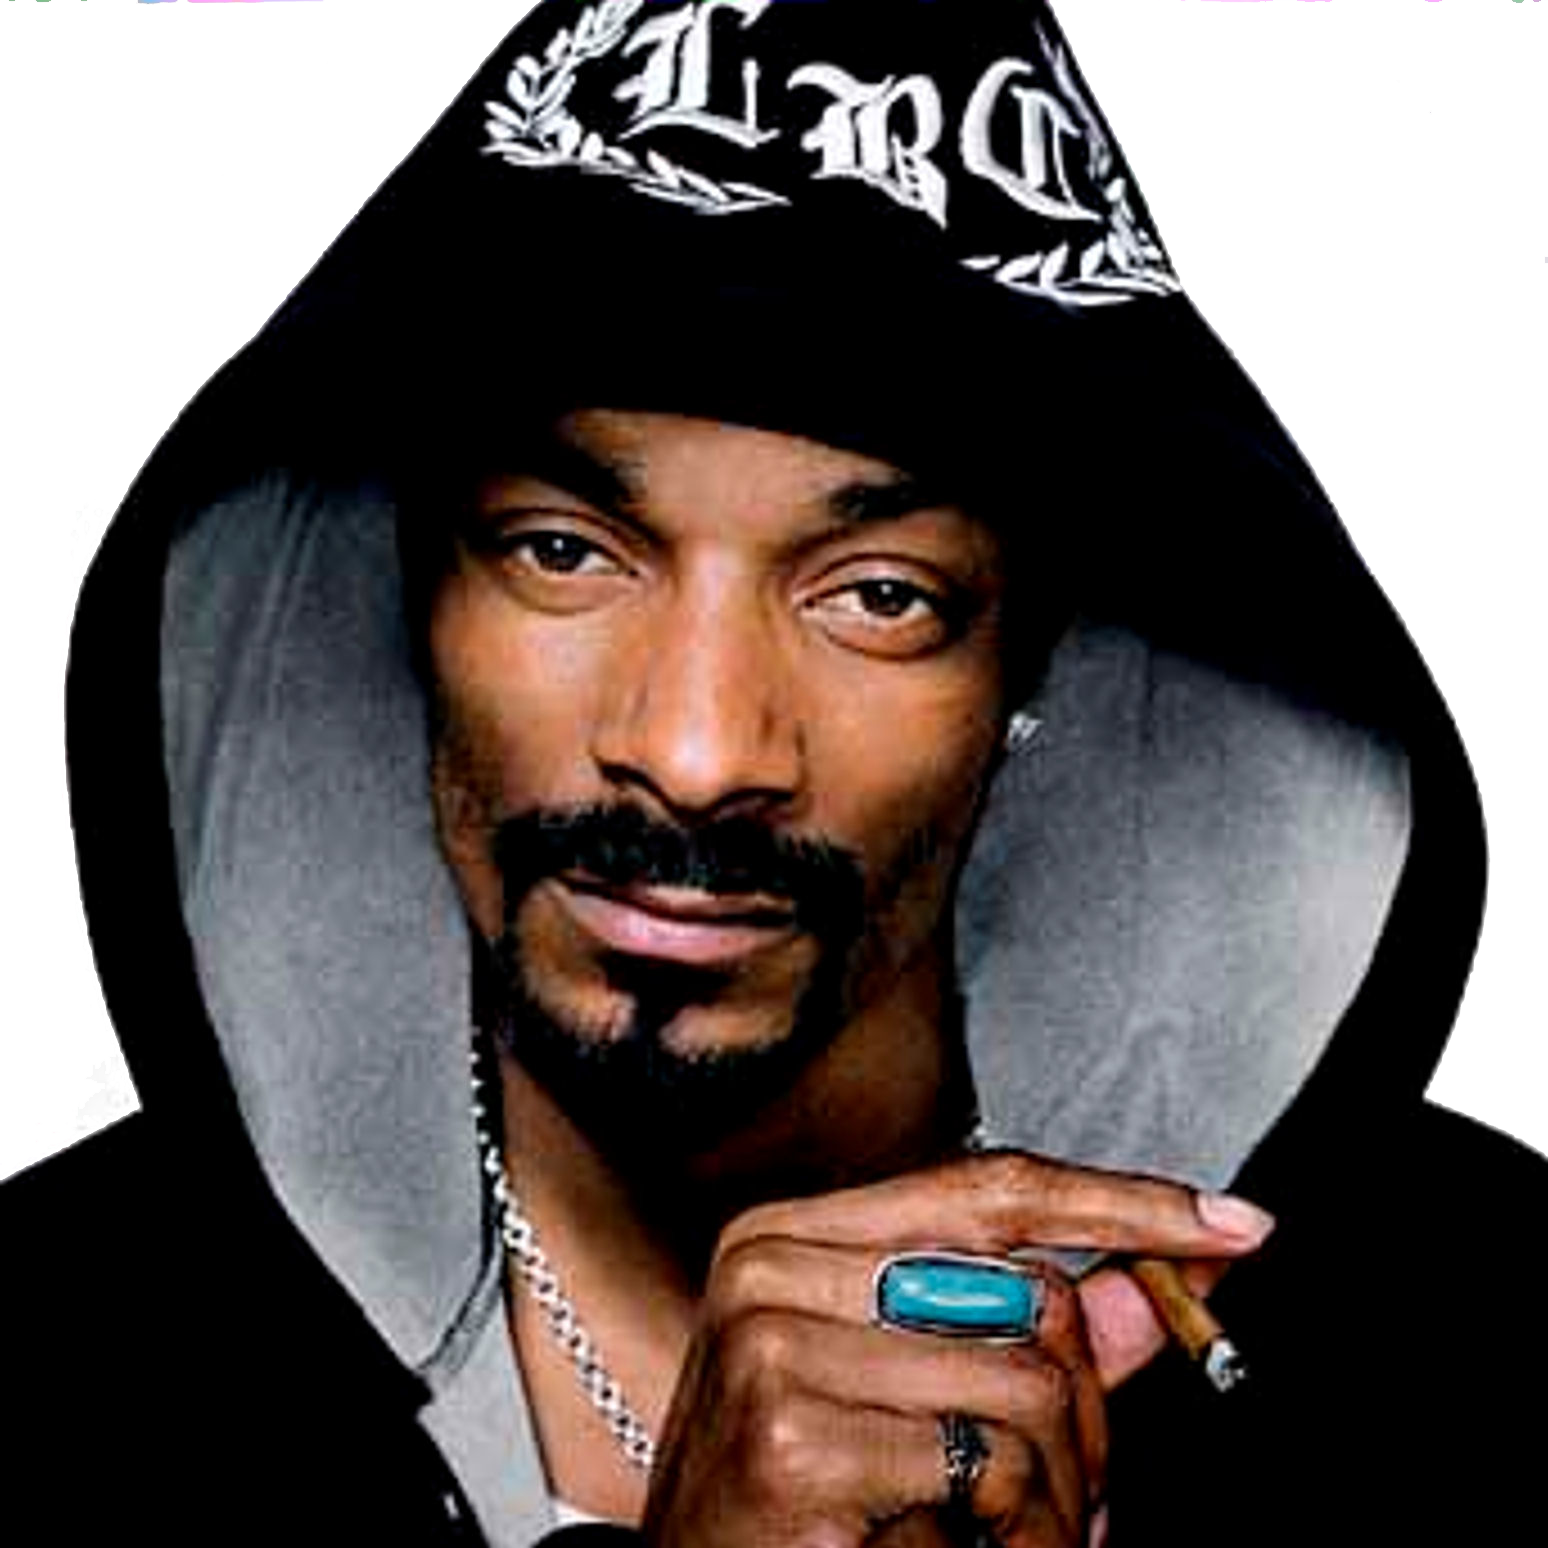 Snoop Dogg PNG File - Snoop Dogg PNG